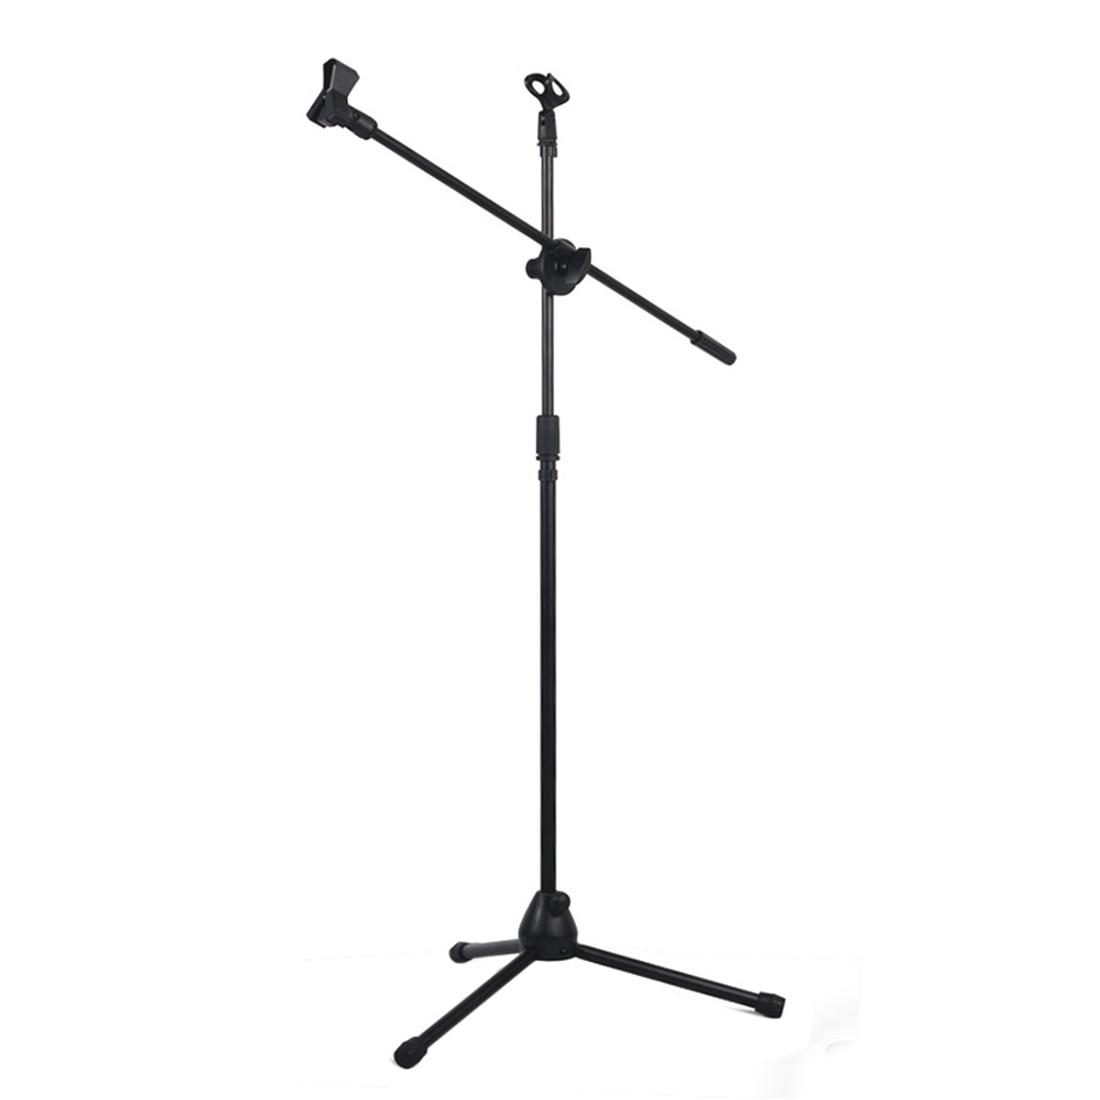 все цены на Professional Microphone Tripod Swing Boom Floor Stand Adjustable Microphone Clip Holder Detachable Stage Microphone Stand онлайн